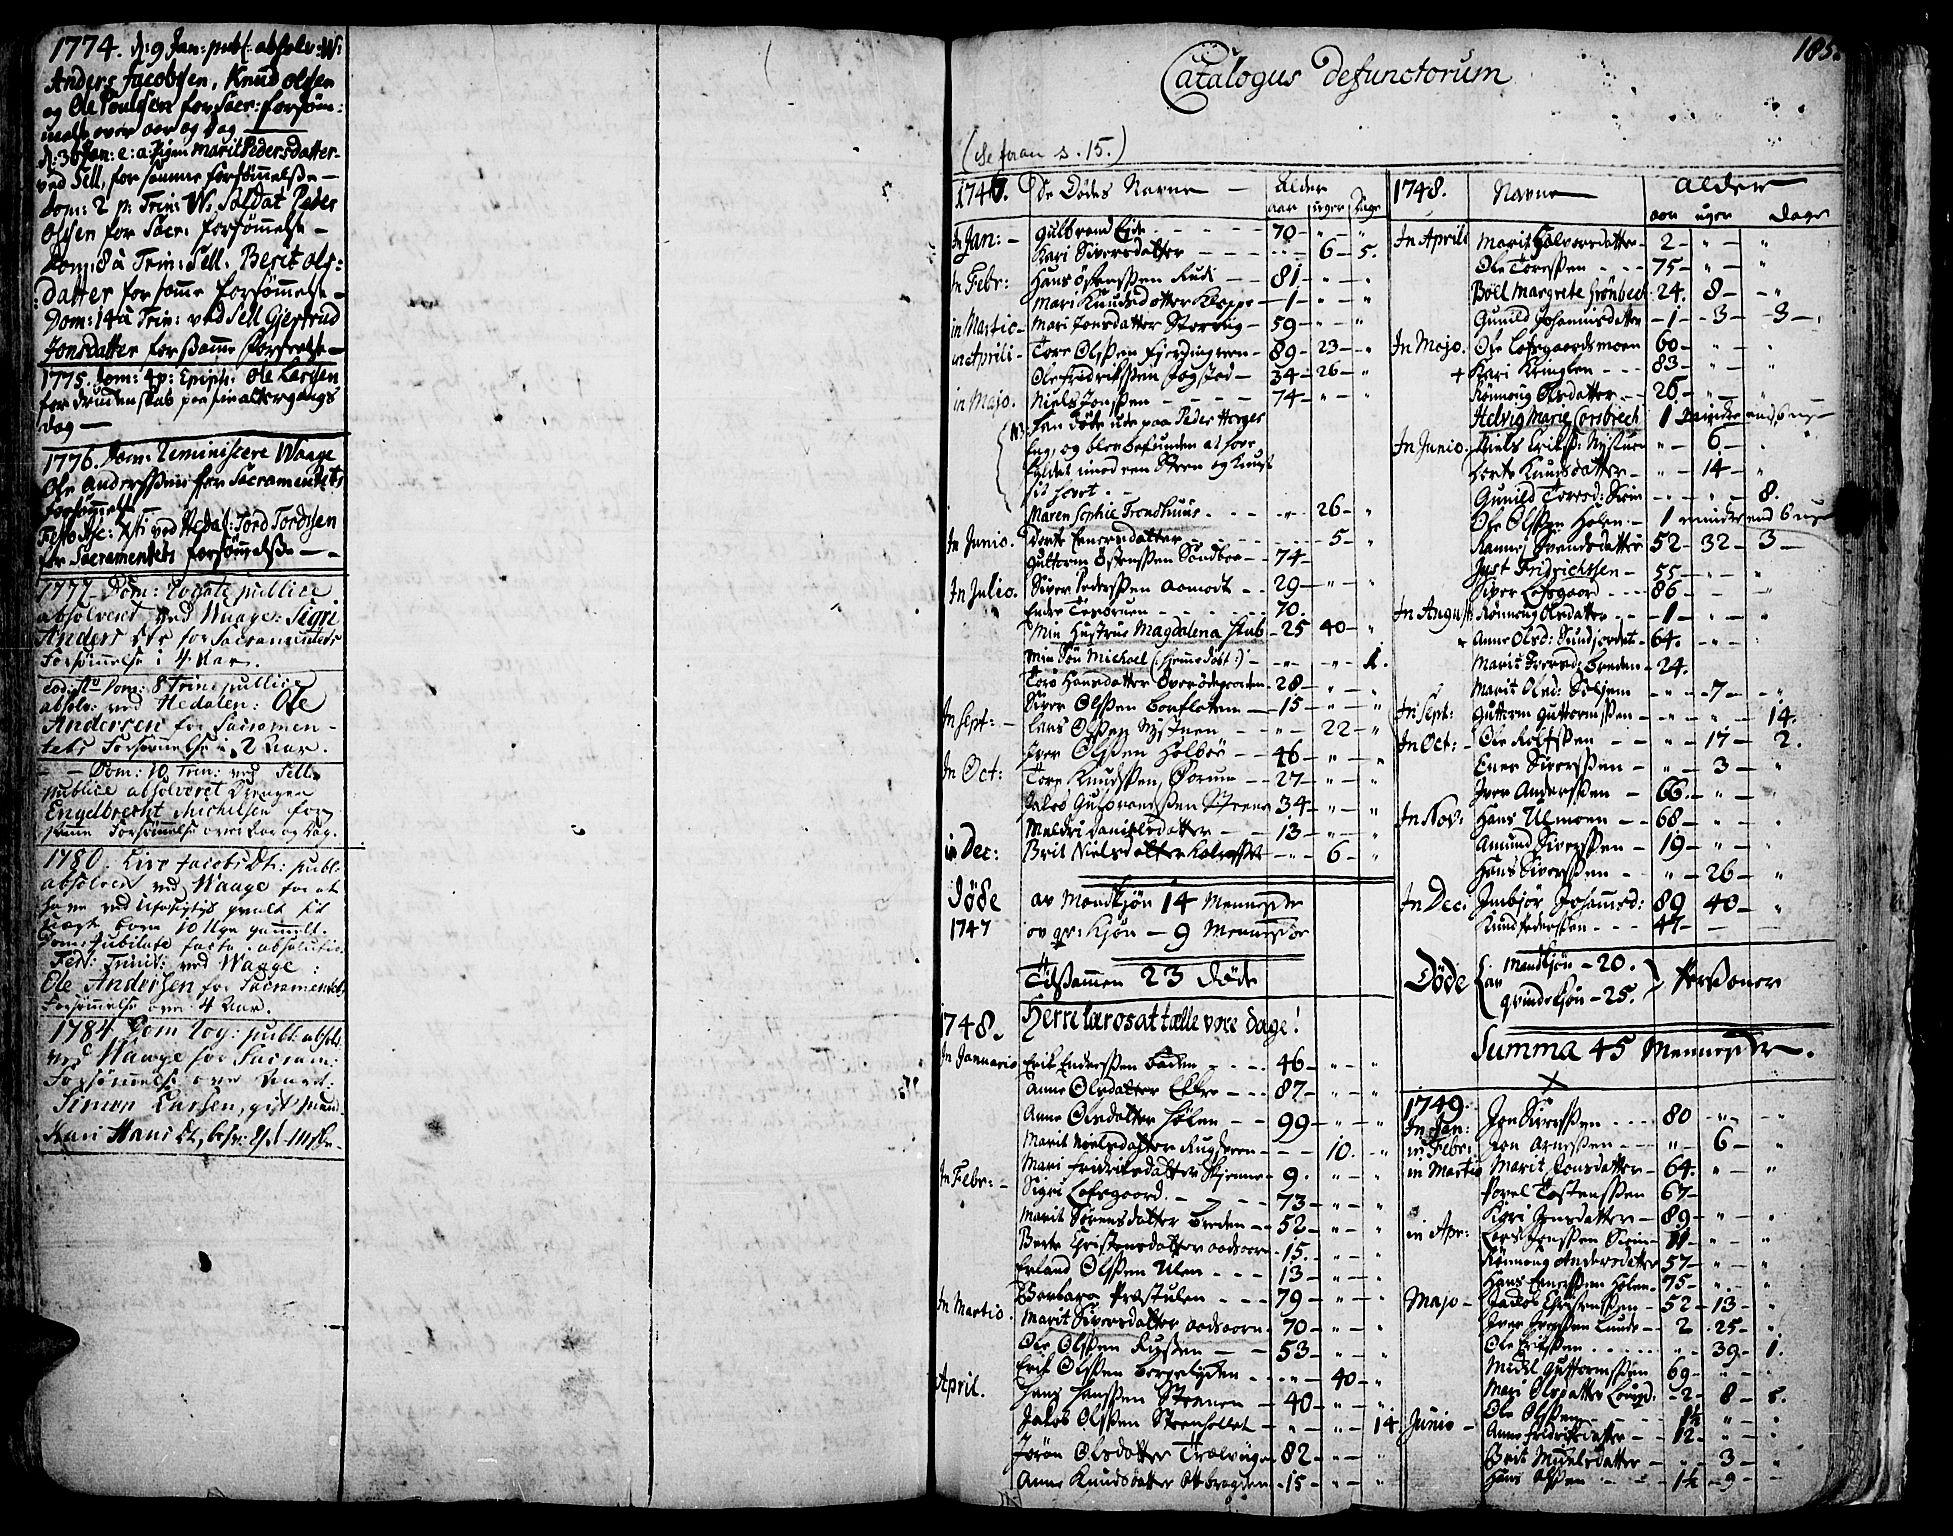 SAH, Vågå prestekontor, Ministerialbok nr. 1, 1739-1810, s. 185